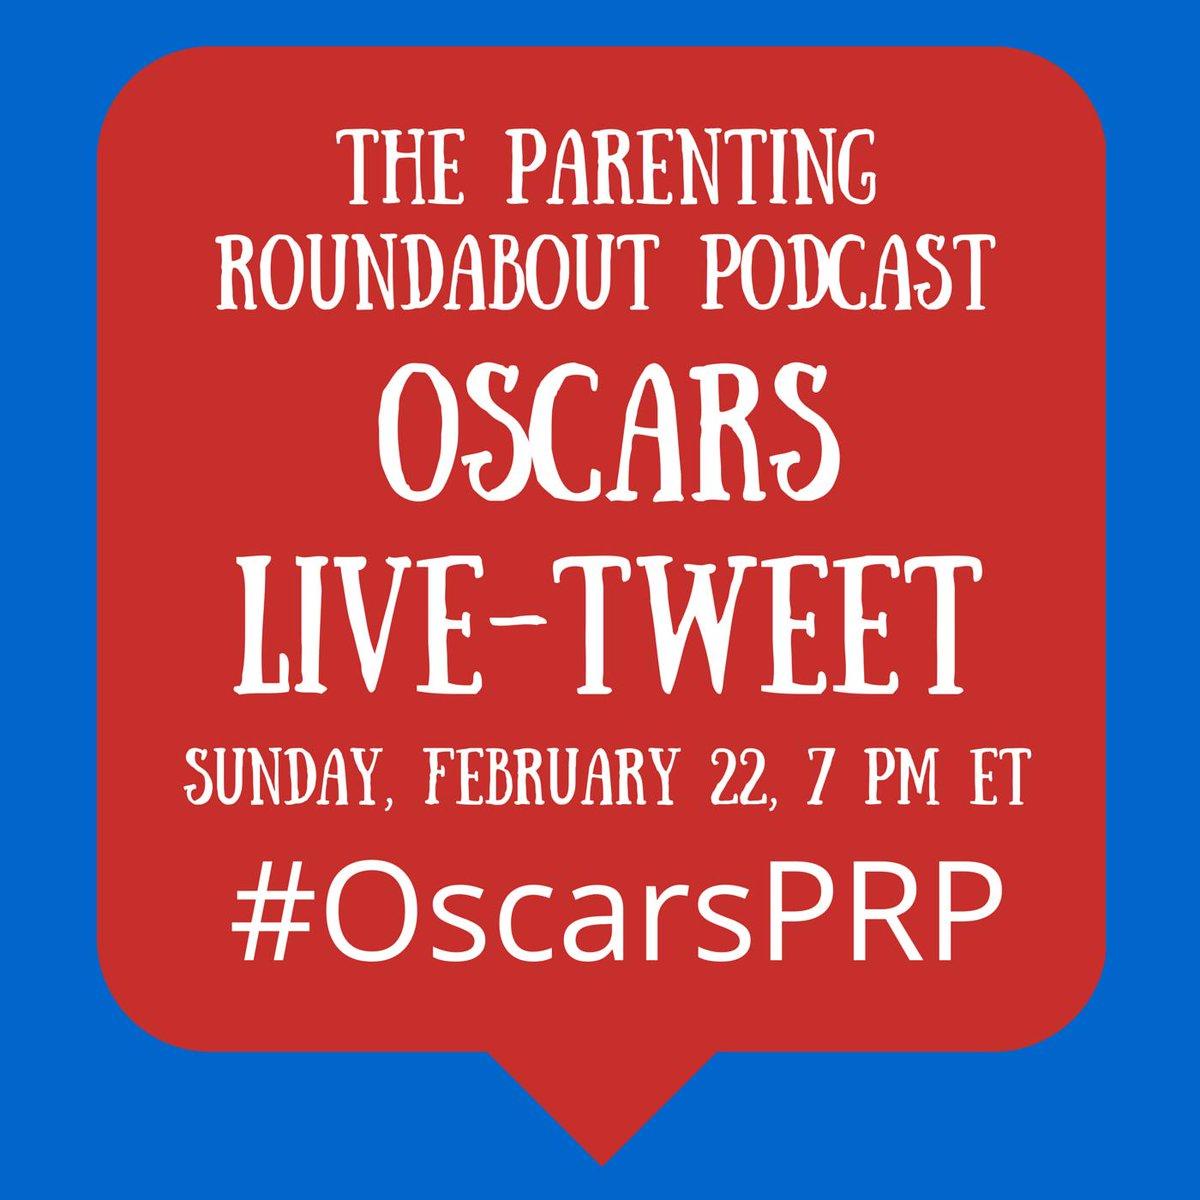 Join @mamatude @AboutFamilyFit @AmandaMorin @Inclusive_Class @KathyCeceri for an Oscars live-tweet tonight #OscarsPRP http://t.co/n1LC0MxCvl